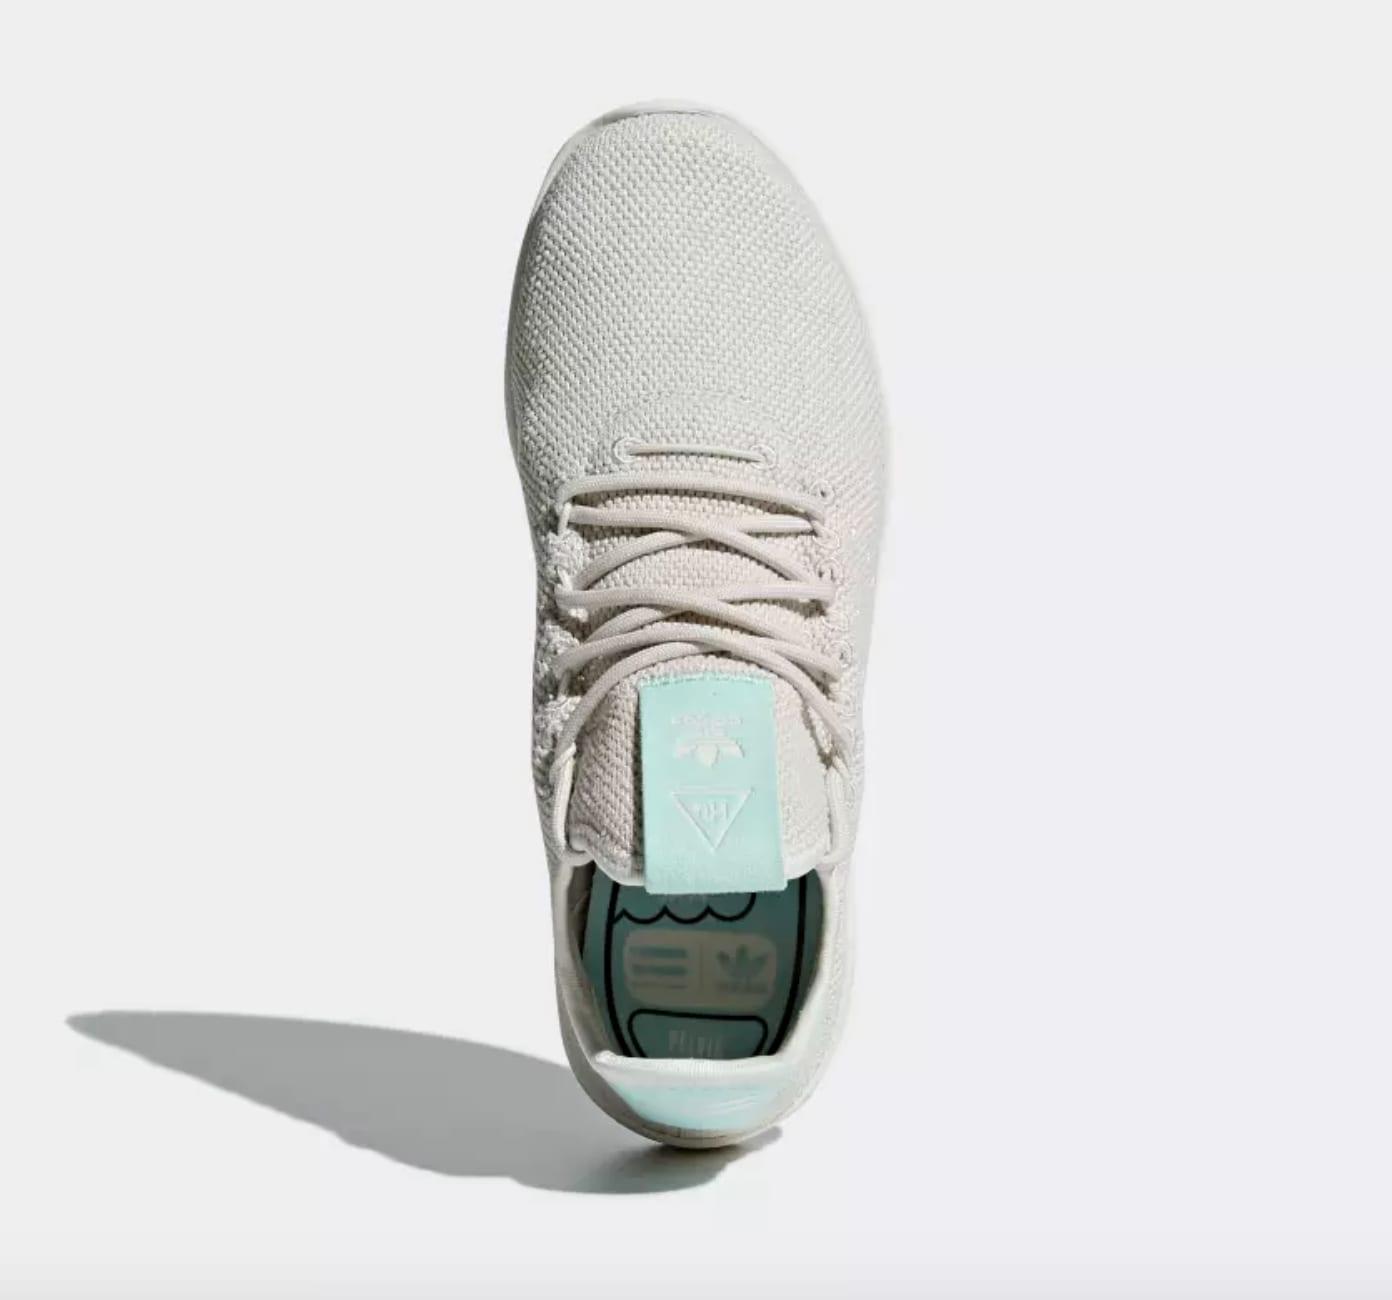 Pharrell x Adidas Tennis Hu B41885 (Top)